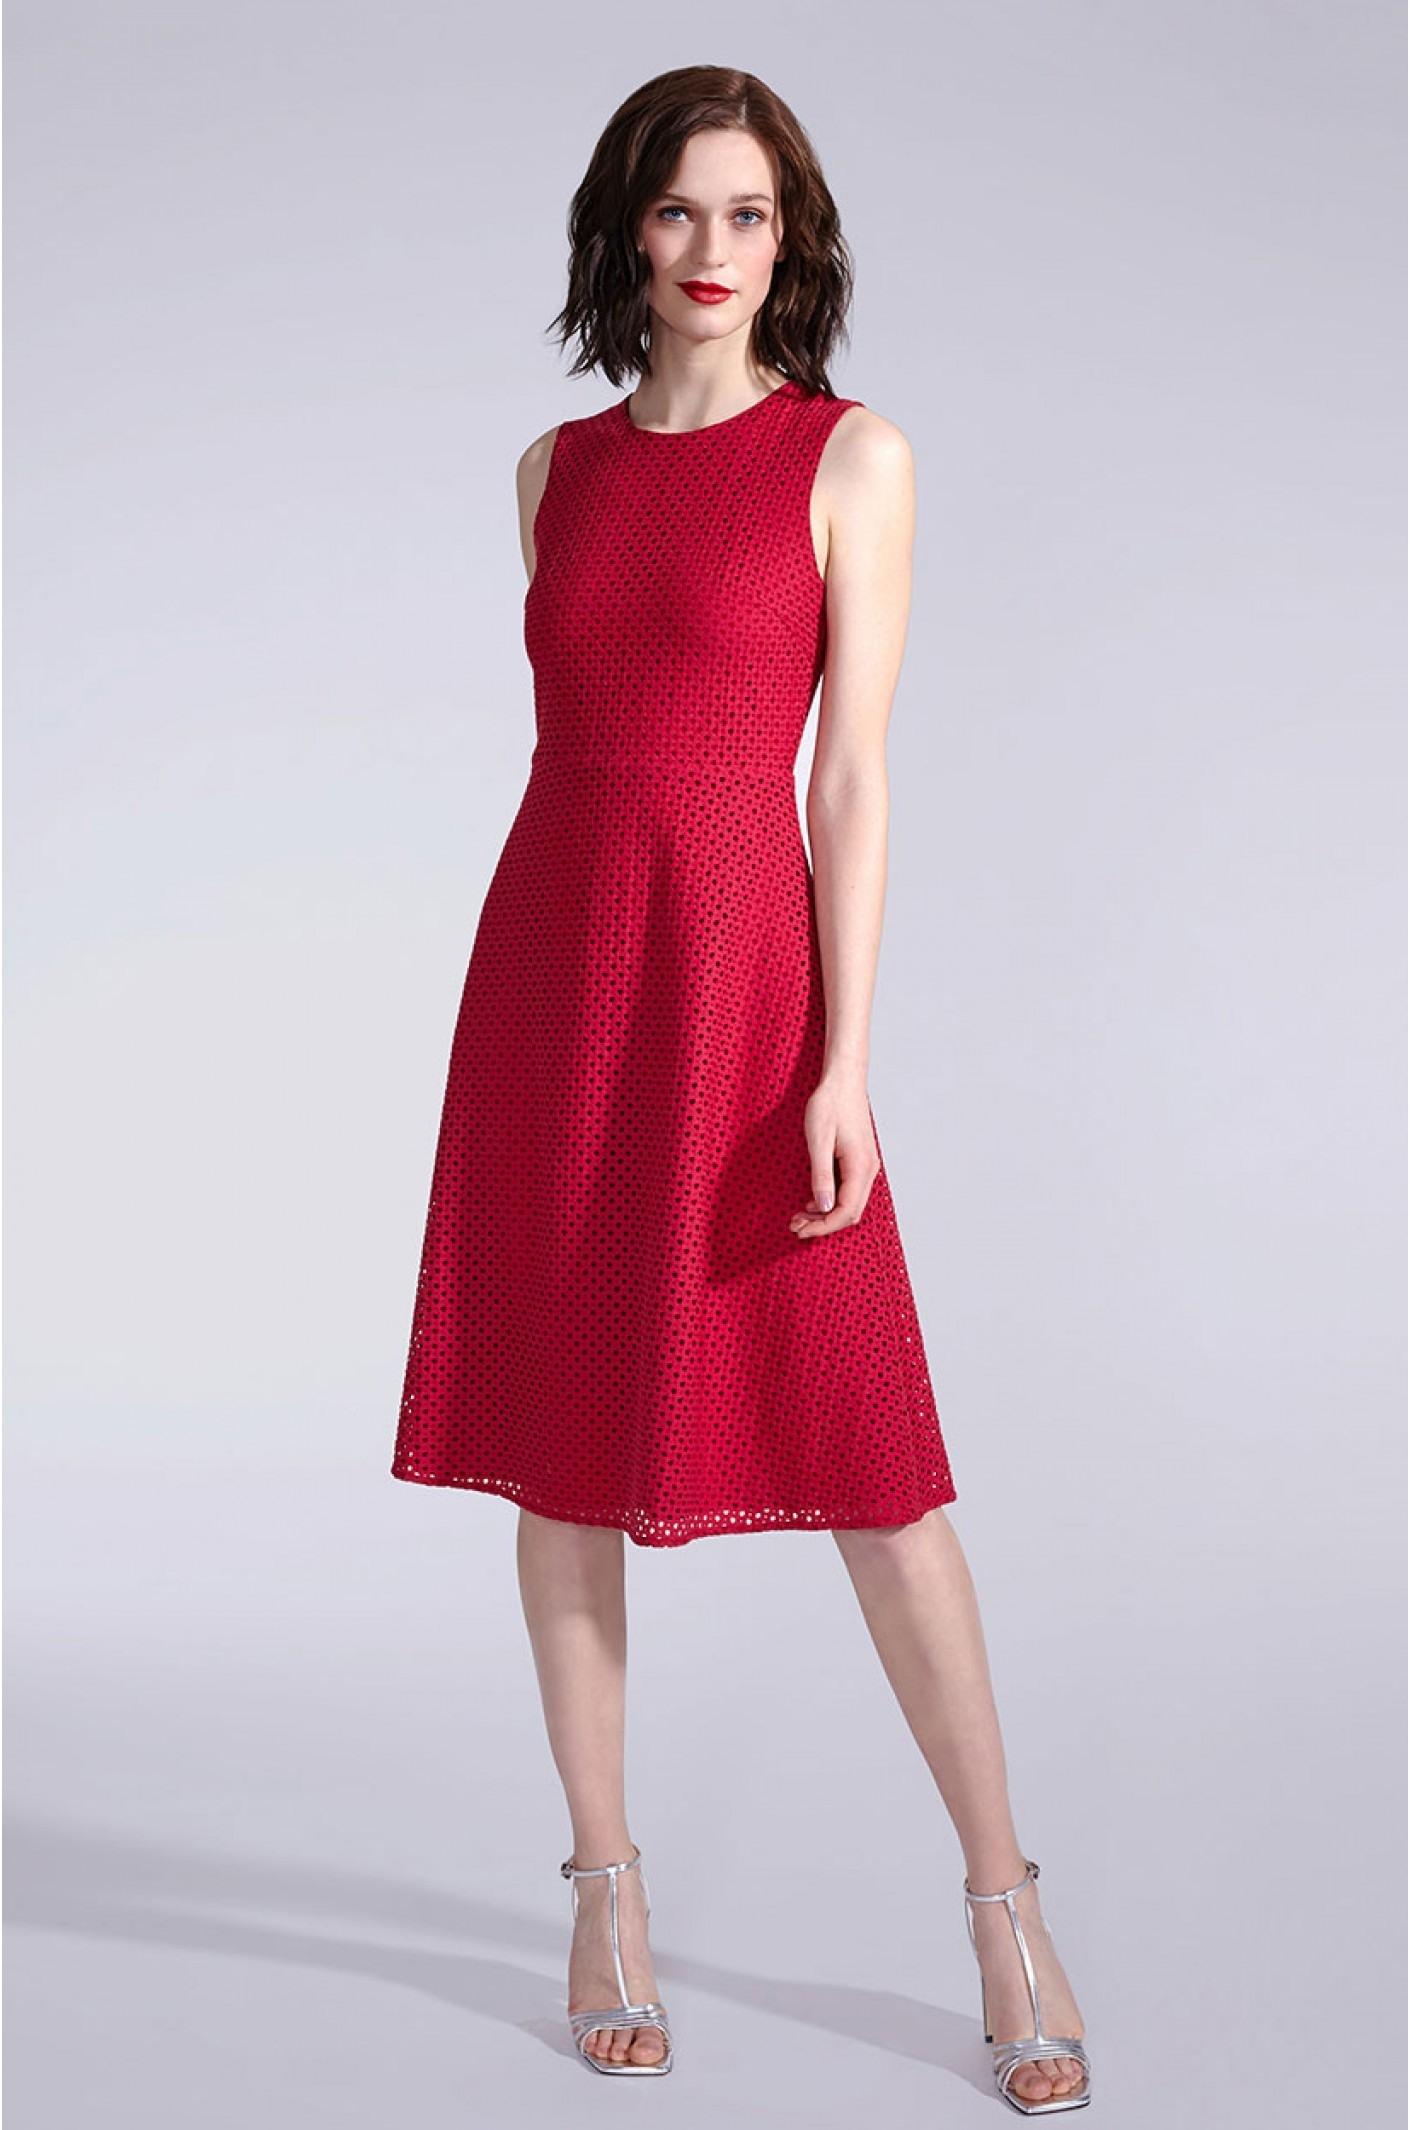 15 Cool Moderne Lange Kleider StylishAbend Genial Moderne Lange Kleider Design